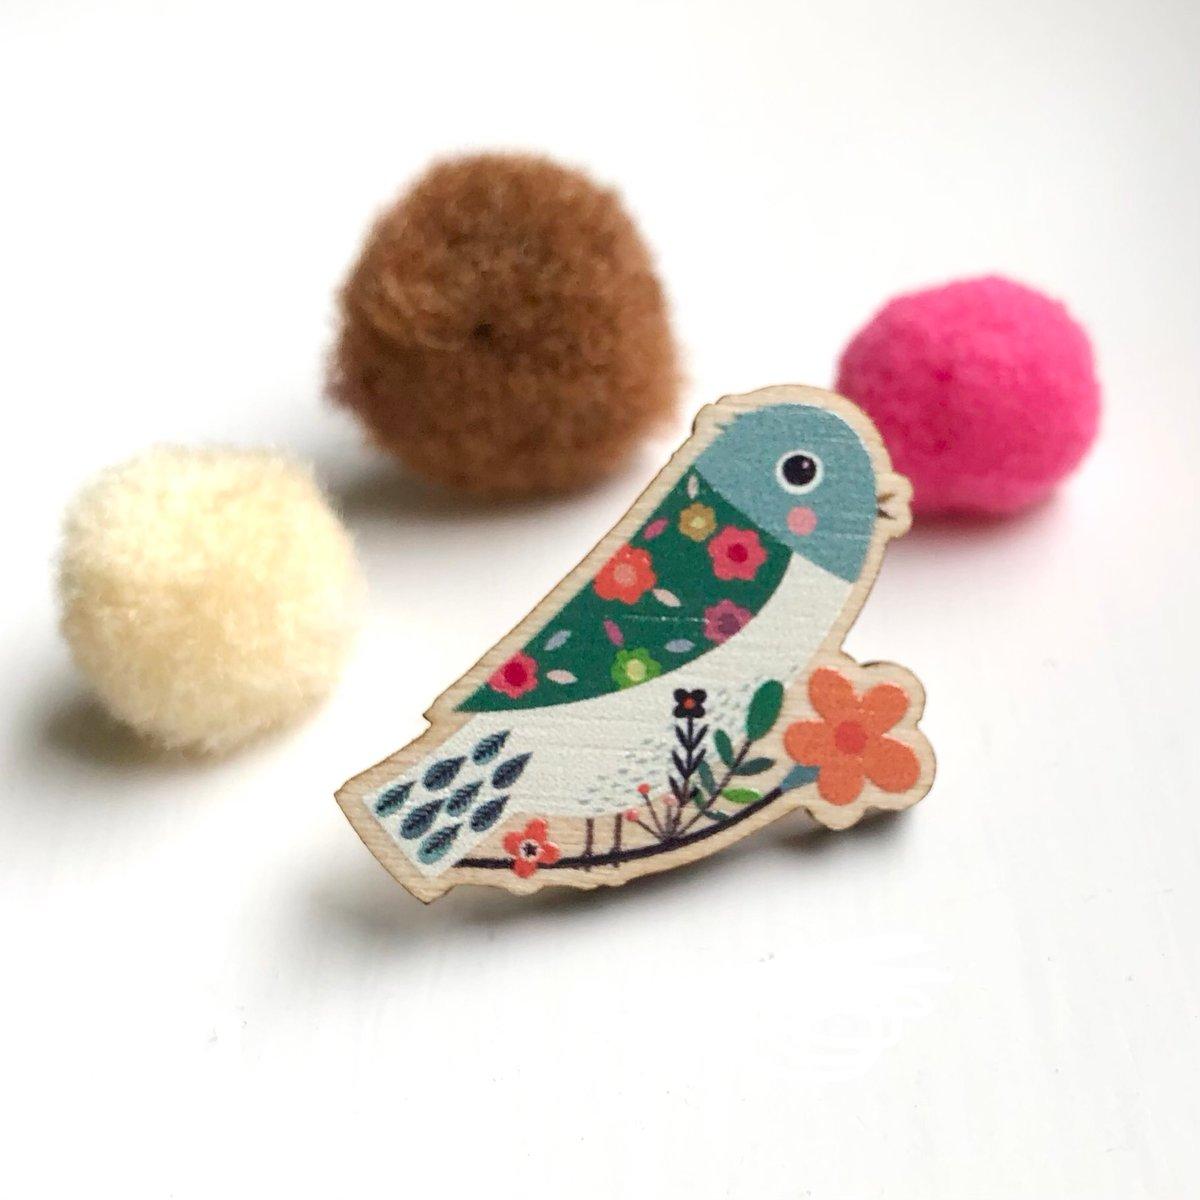 'Little Birdie' - wooden pin